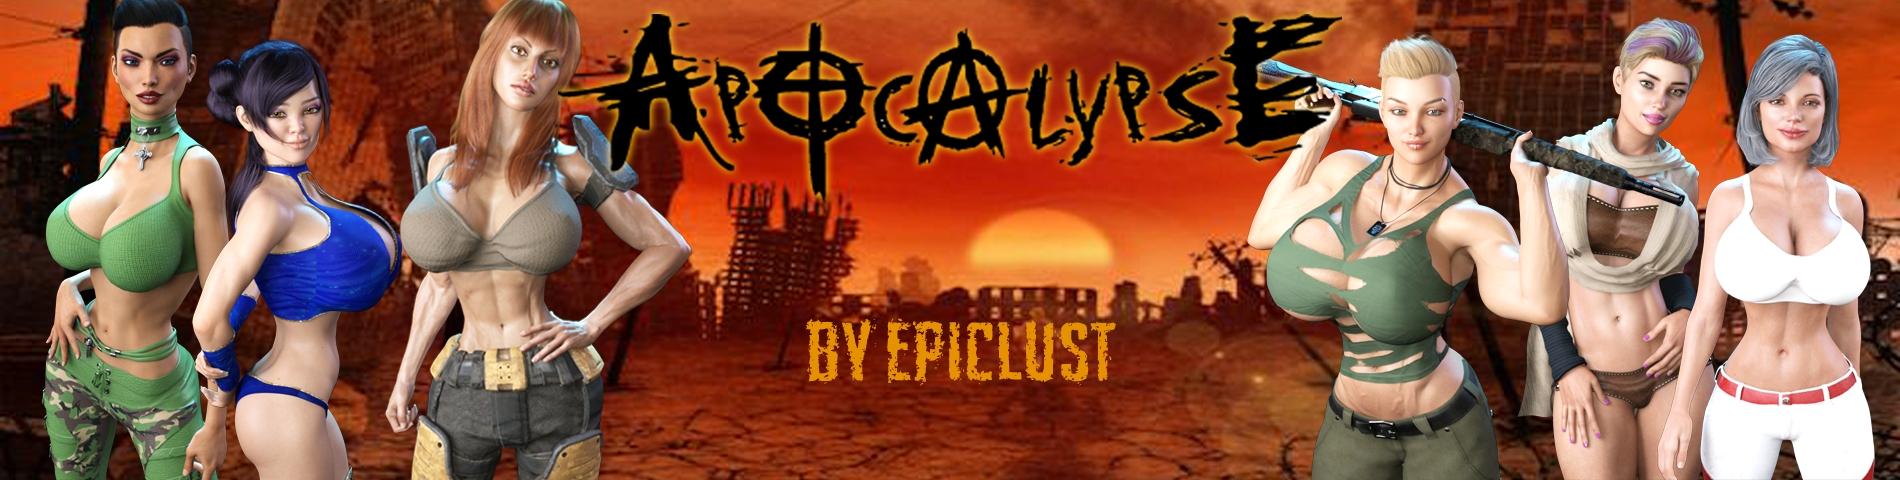 Apocalypse [EpicLust]